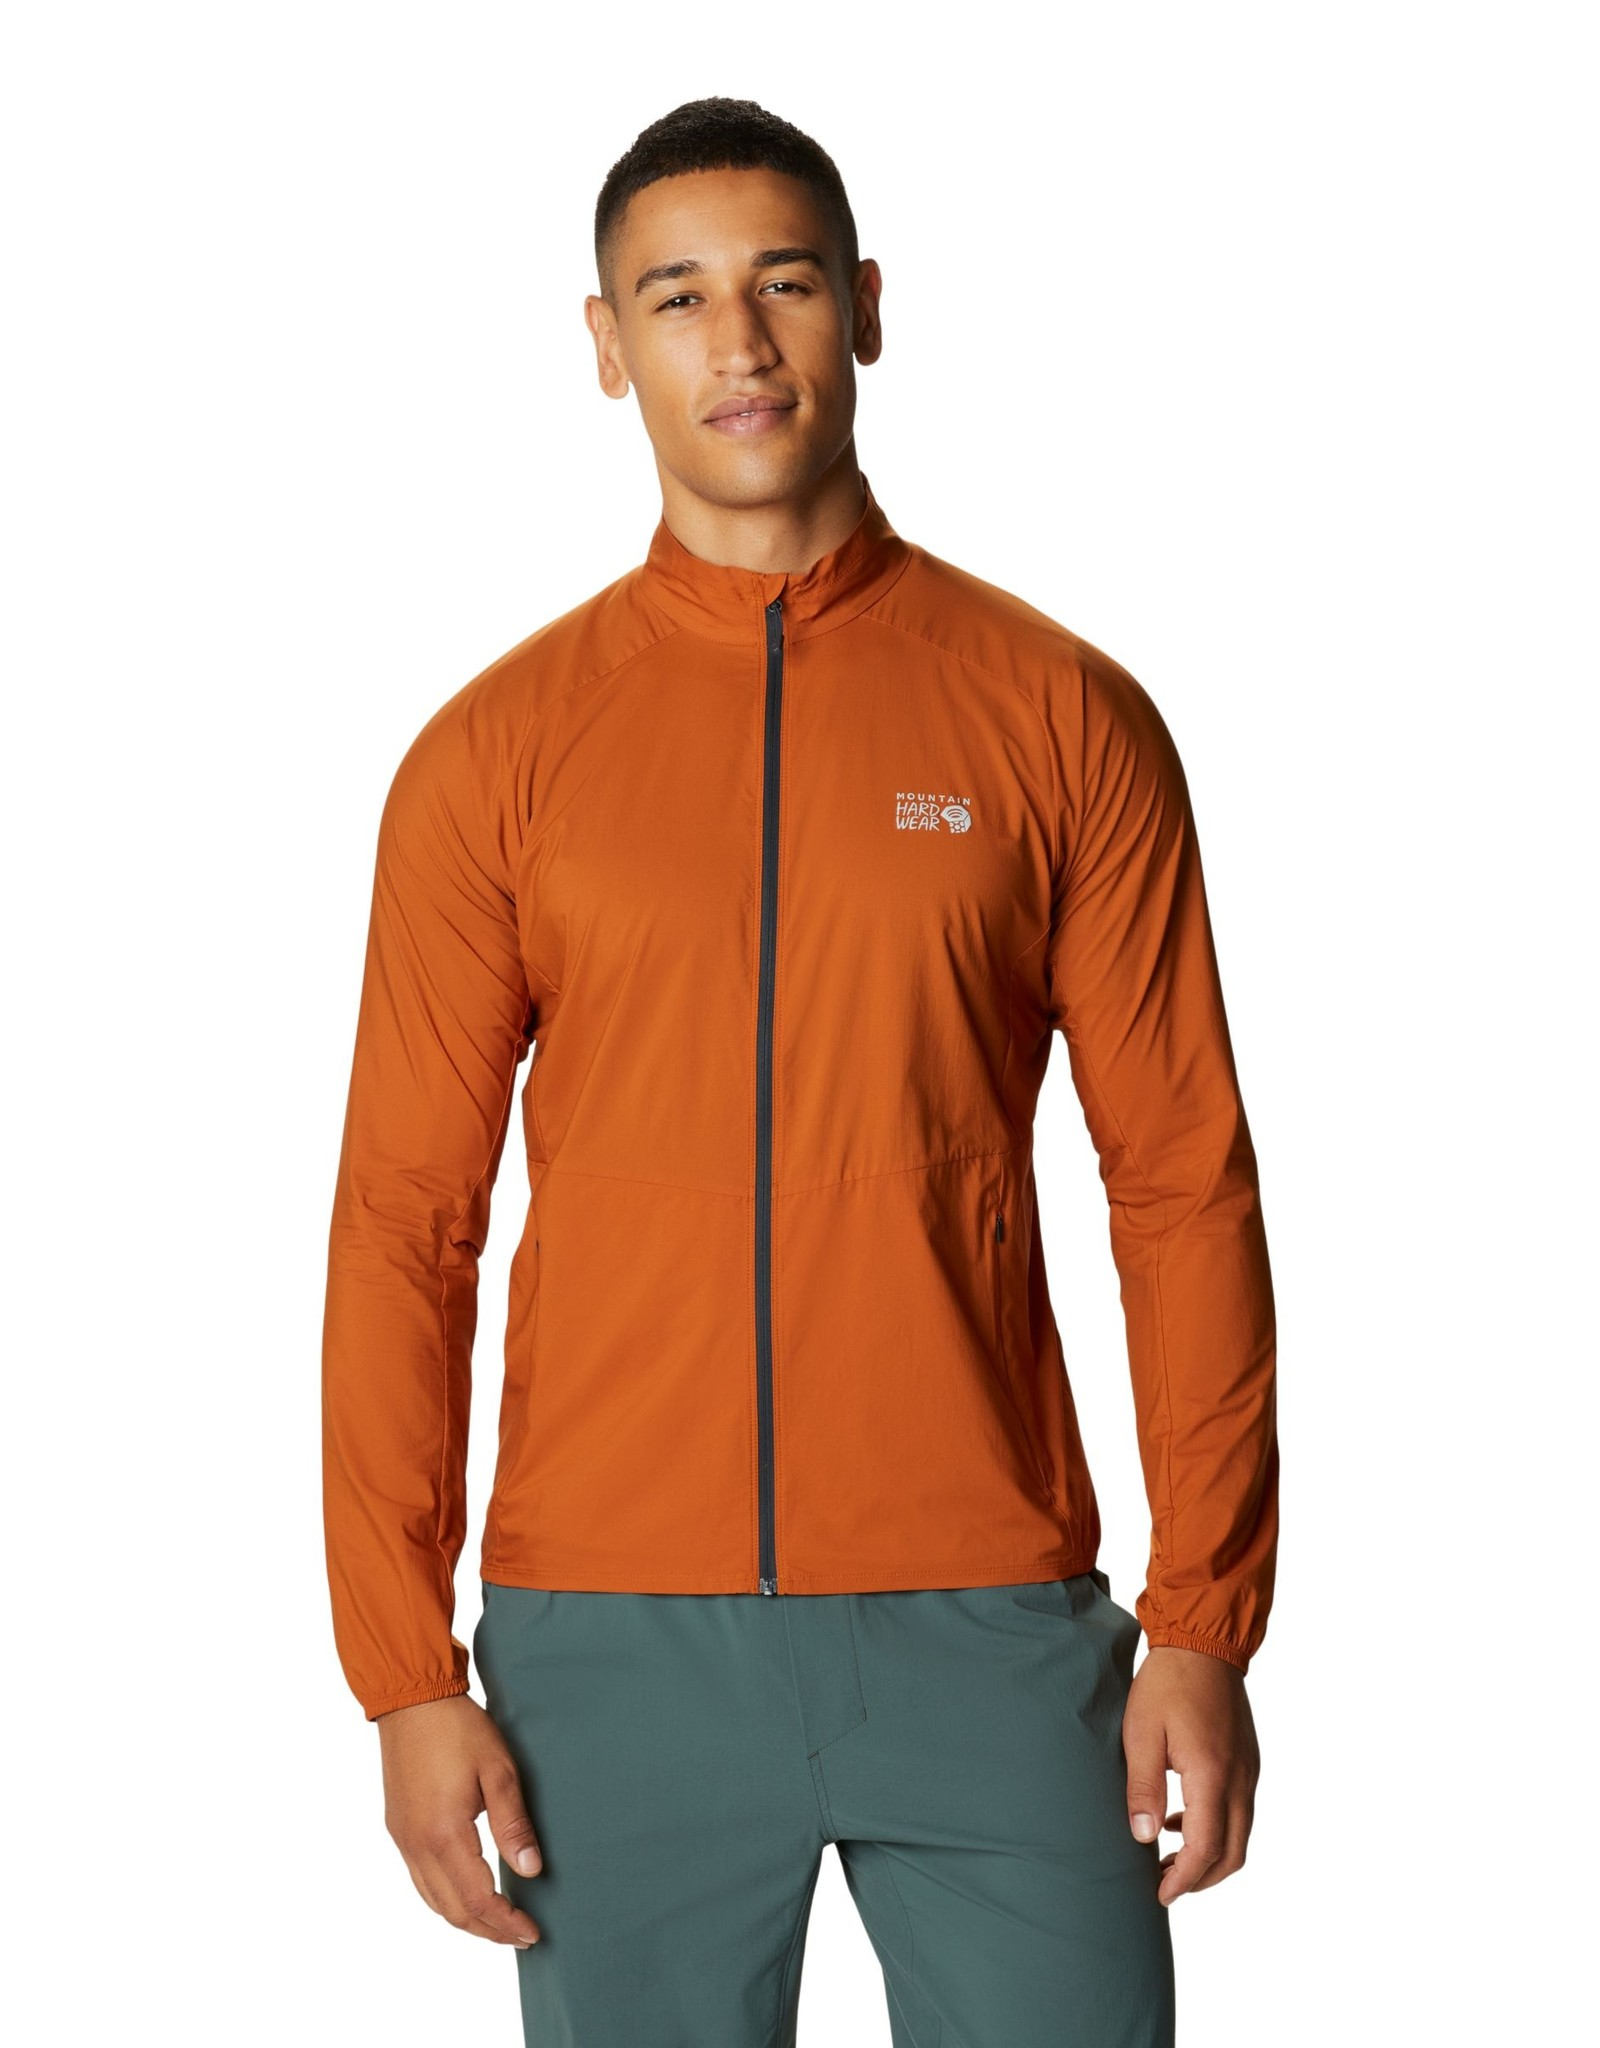 Mountain Hardwear Mountain Hardwear M's Kor Preshell jacket